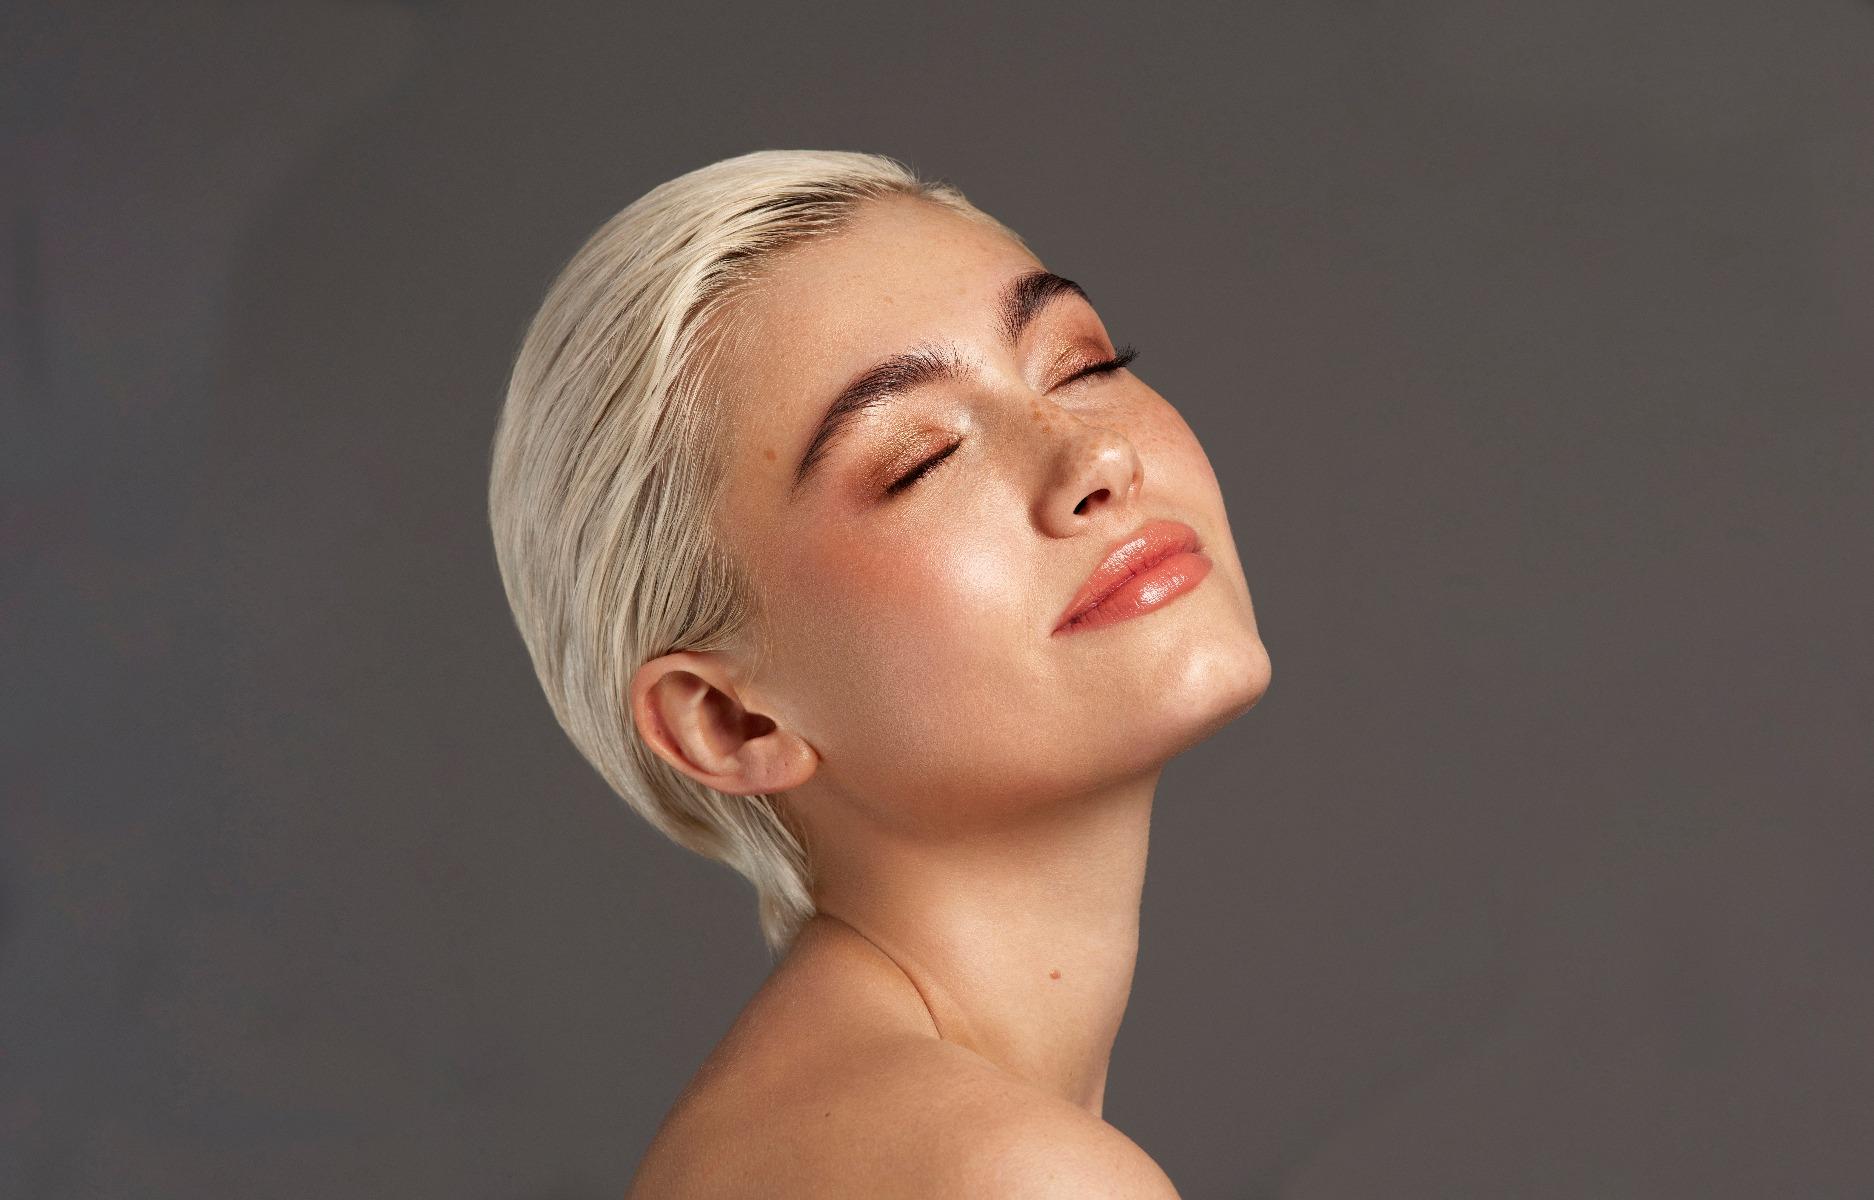 Makeup Look with Blonde Hair